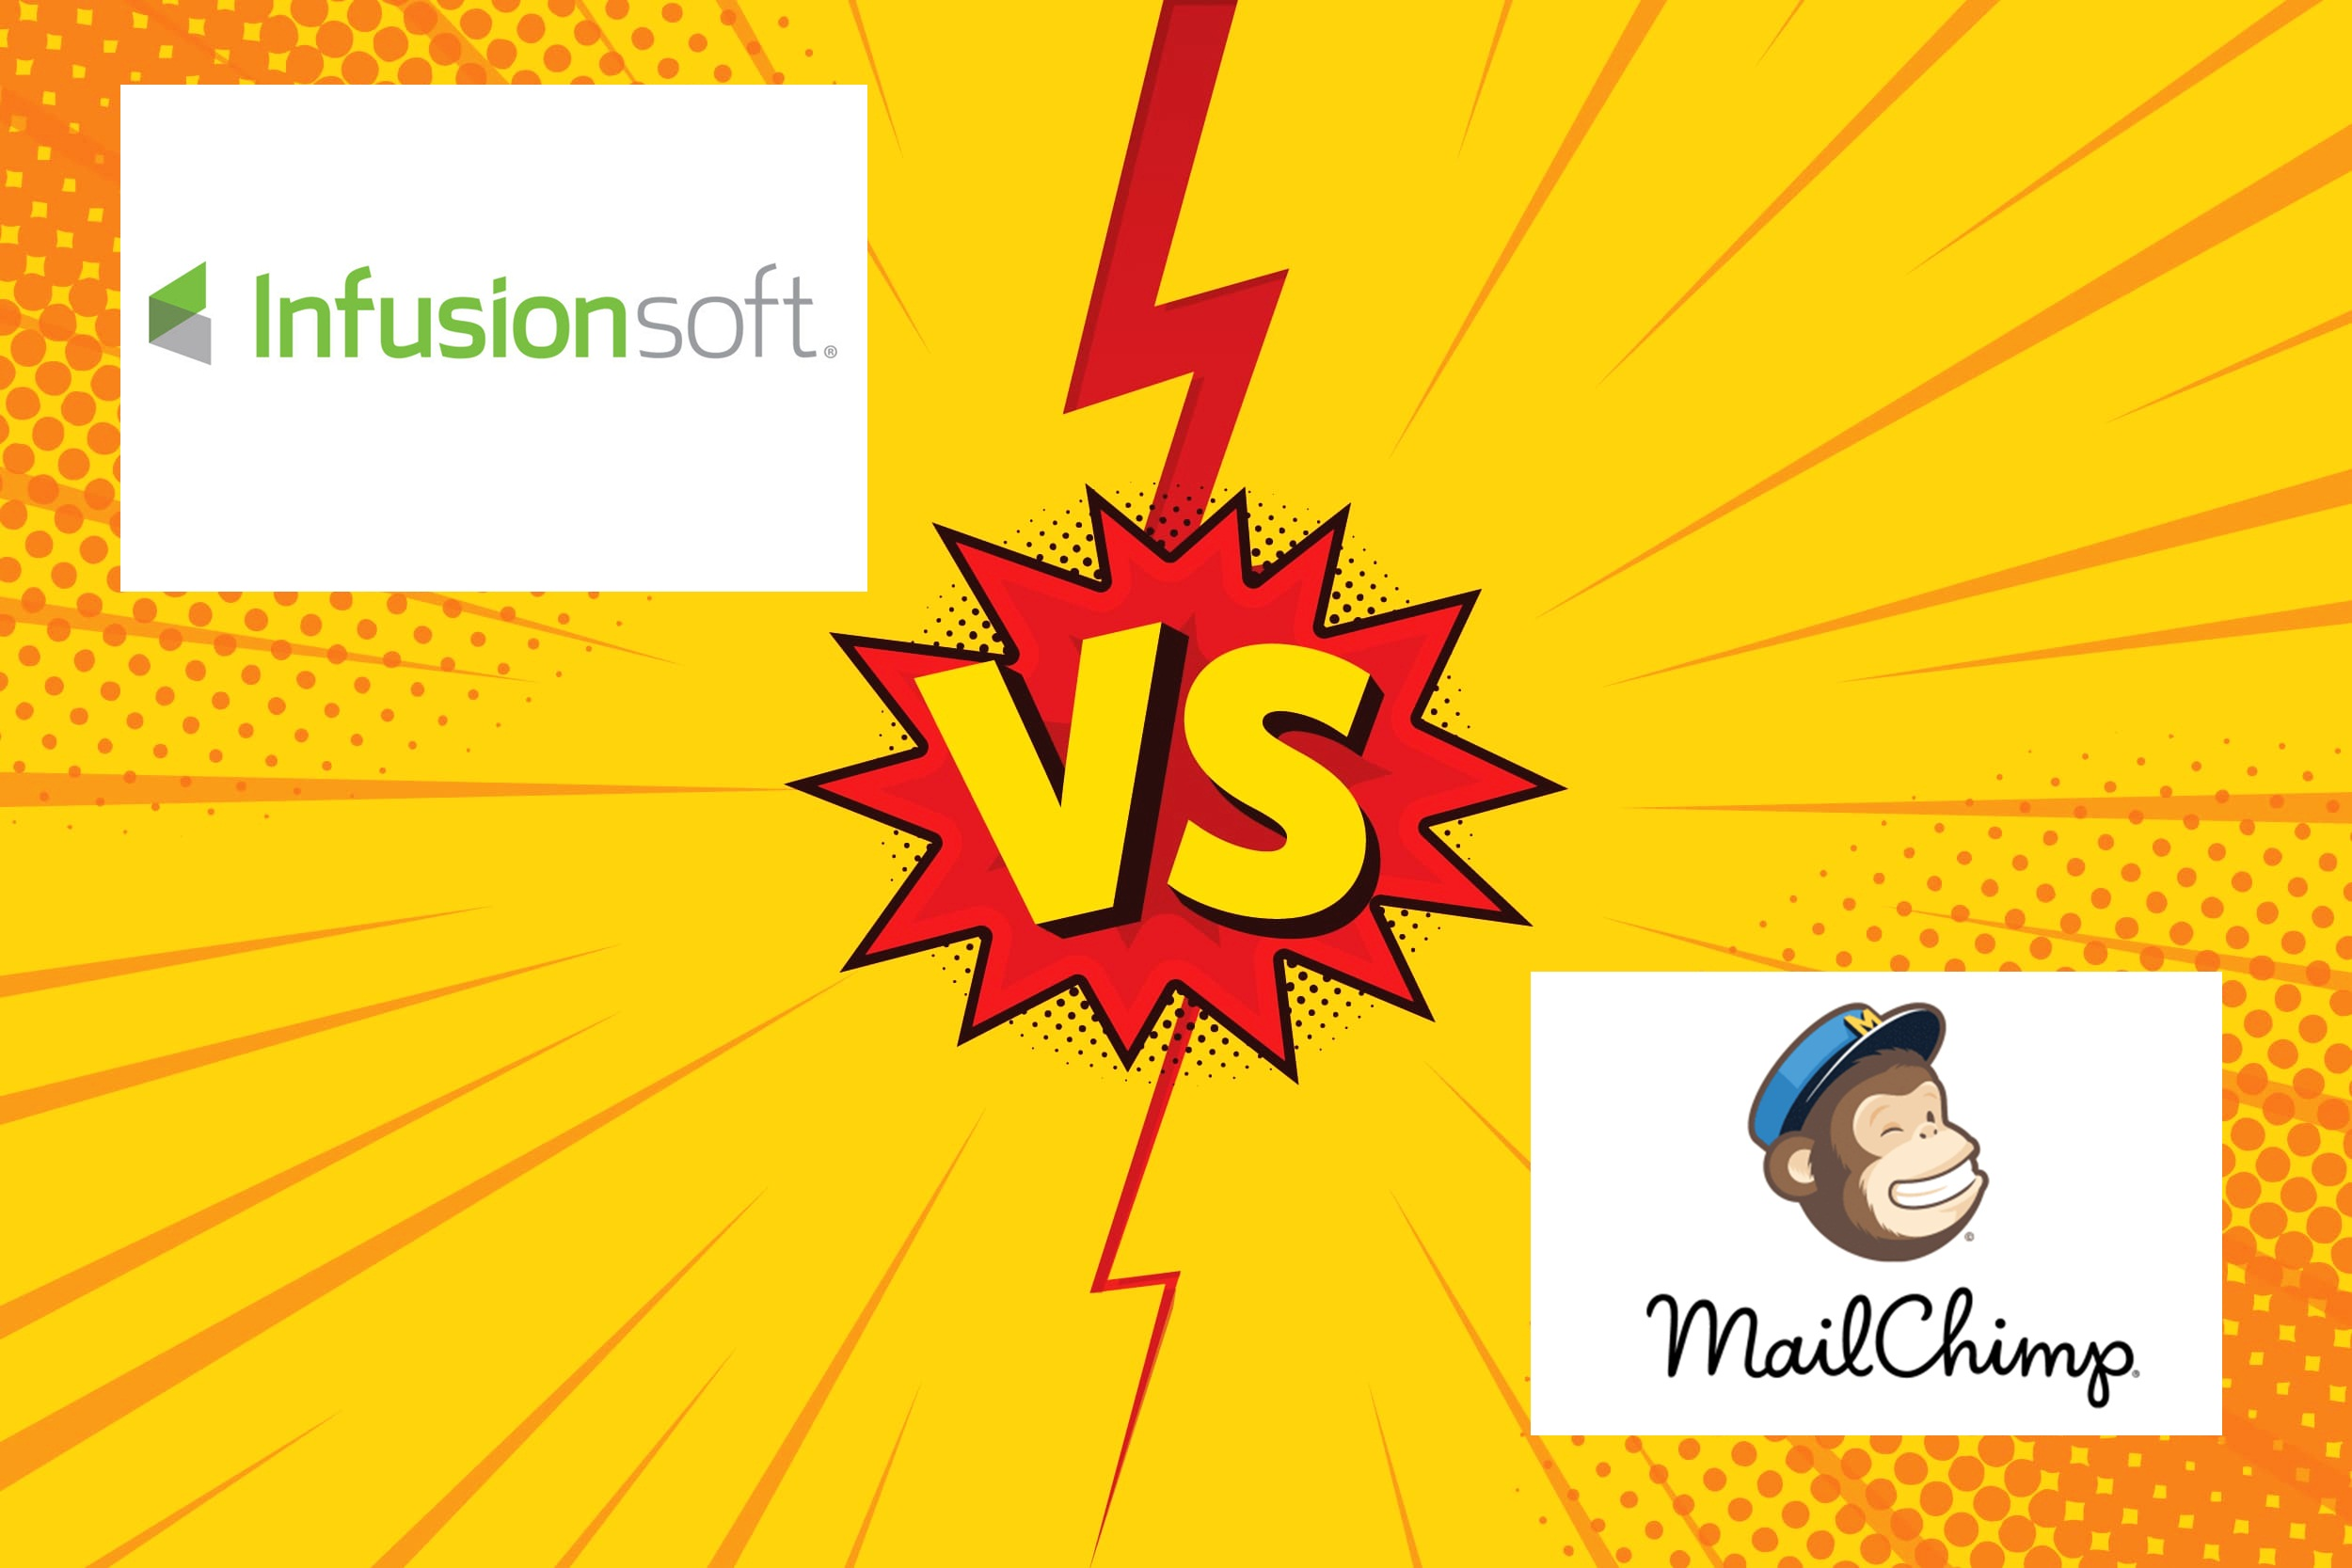 infusionsoft vs mailchimp